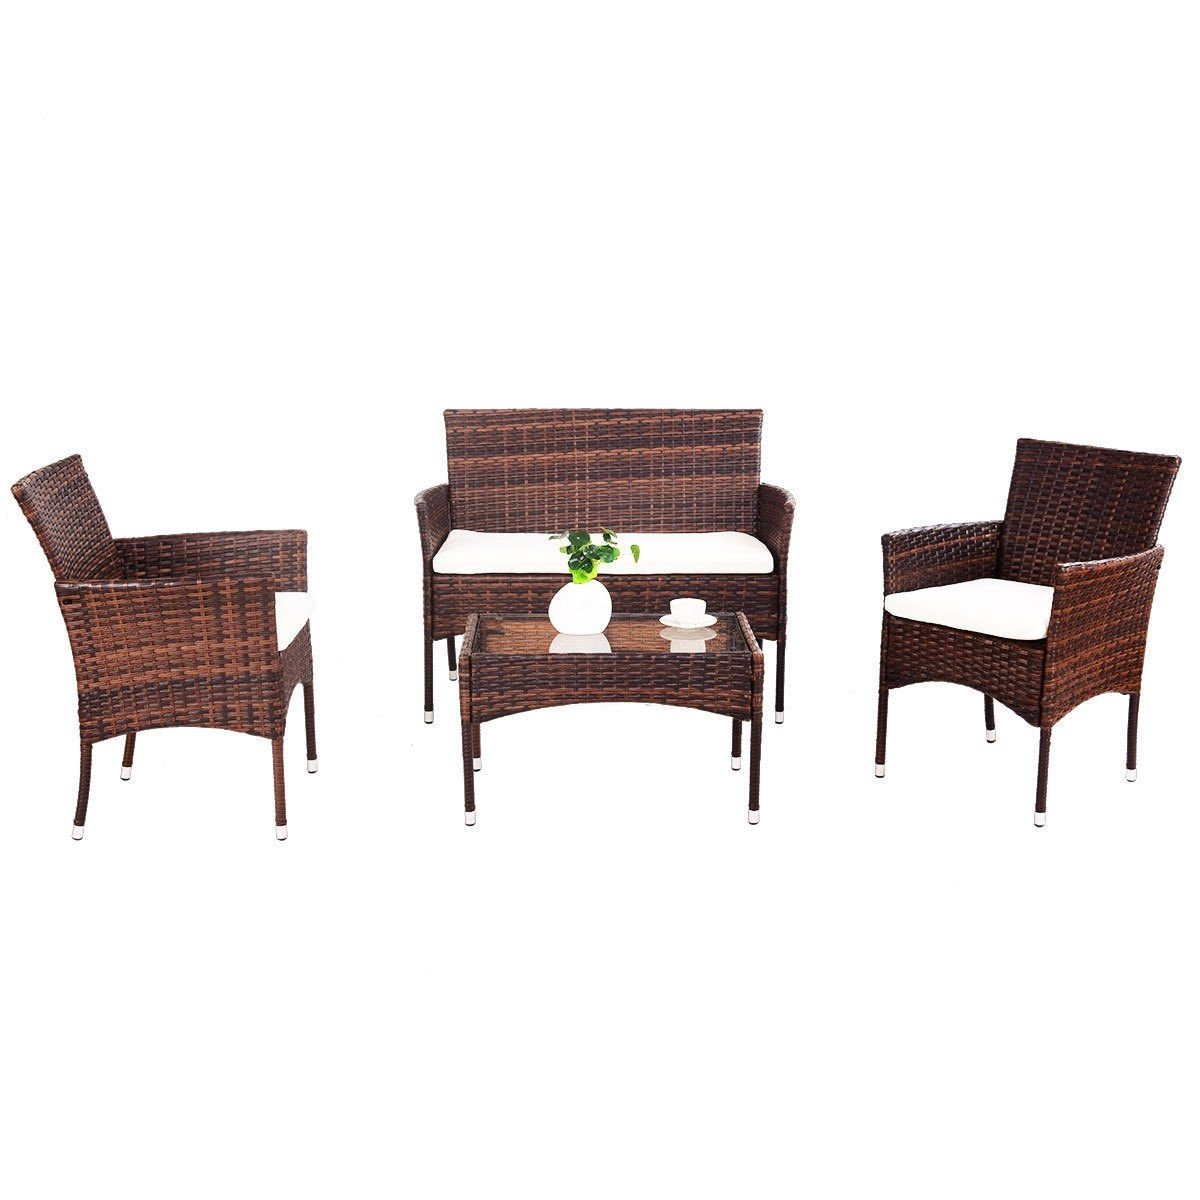 EnjoyShop 4 Pcs PE Rattan Wicker Table Shelf Sofa Furniture Set with Cushion Dining Garden Picnic Outdoor by EnjoyShop (Image #8)